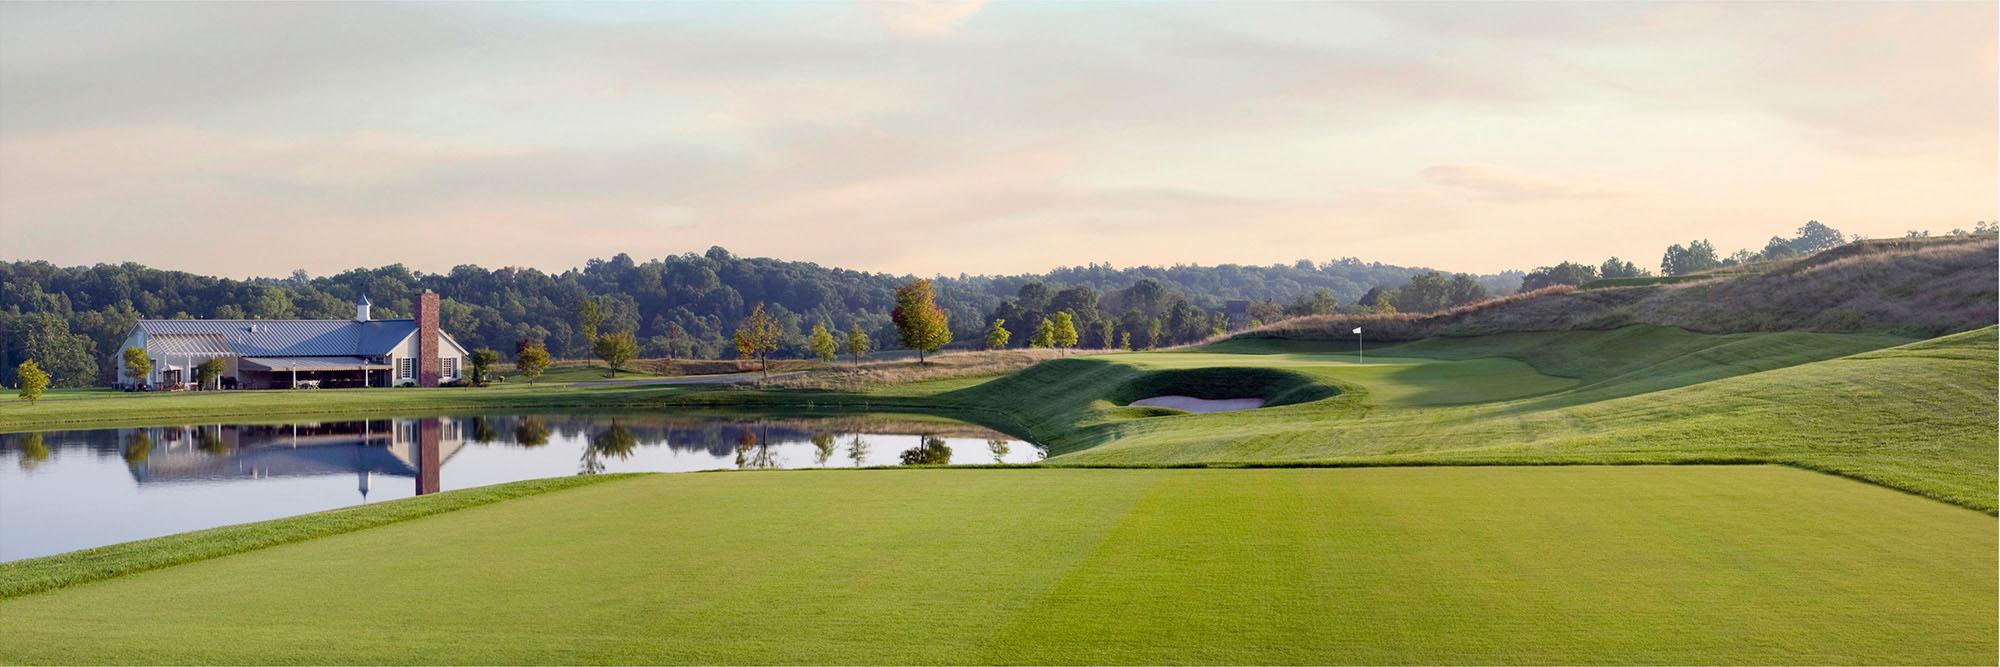 Golf Course Image - Ledgerock Golf Club No. 14